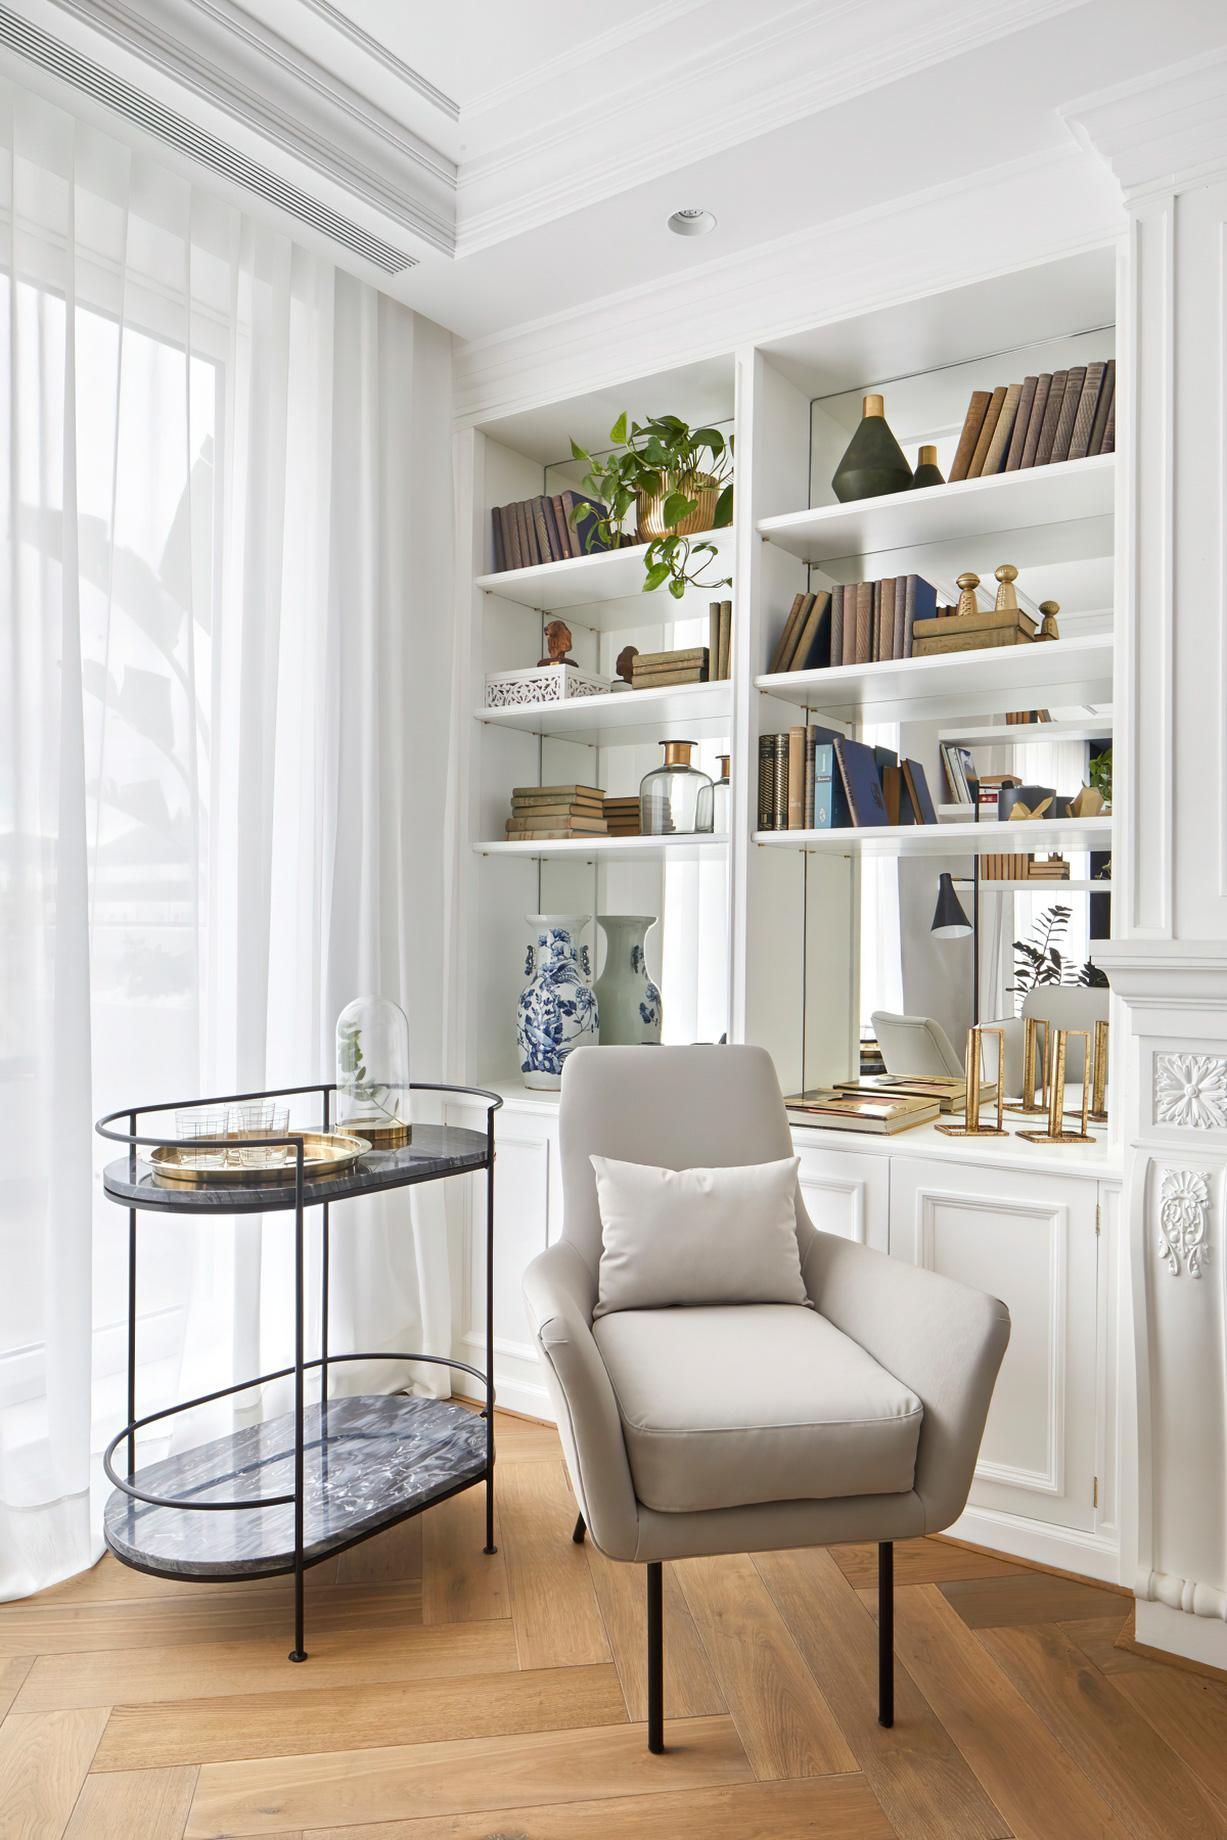 Carrer Arago Apartment Interior Barcelona, Spain – Miriam Barrio